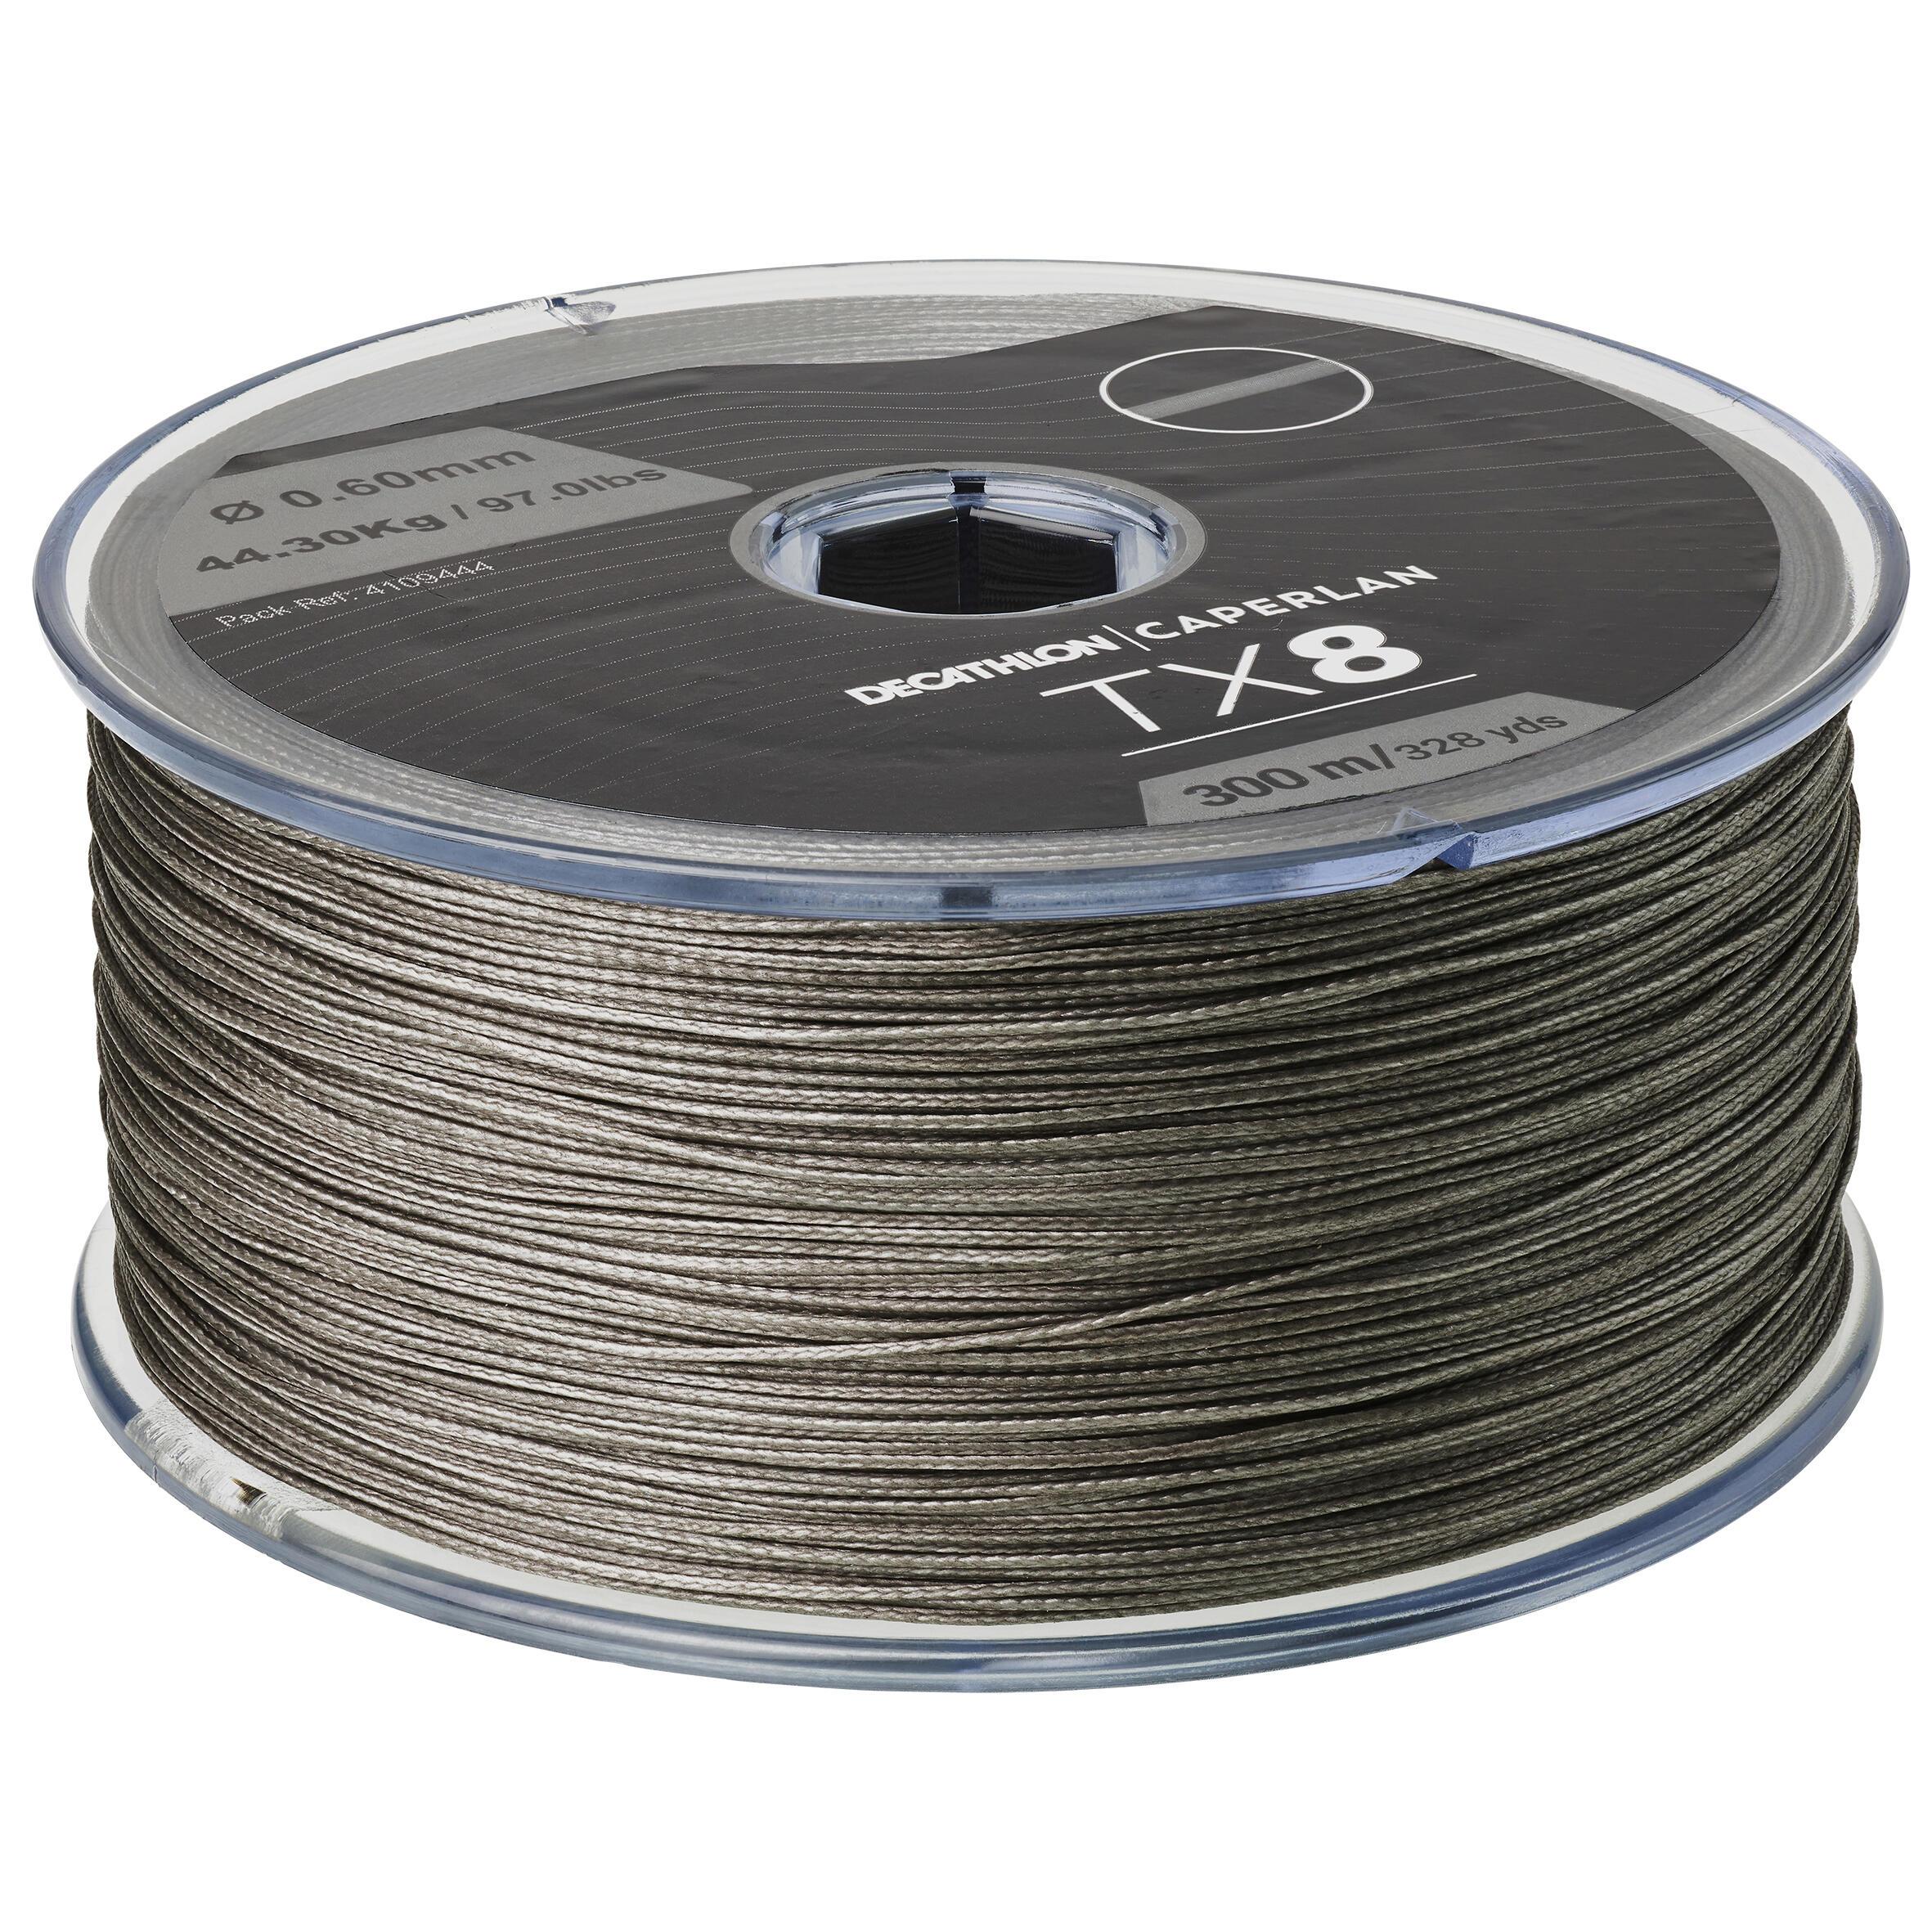 Fir textil TX8 GRI 300M 60/100 imagine produs